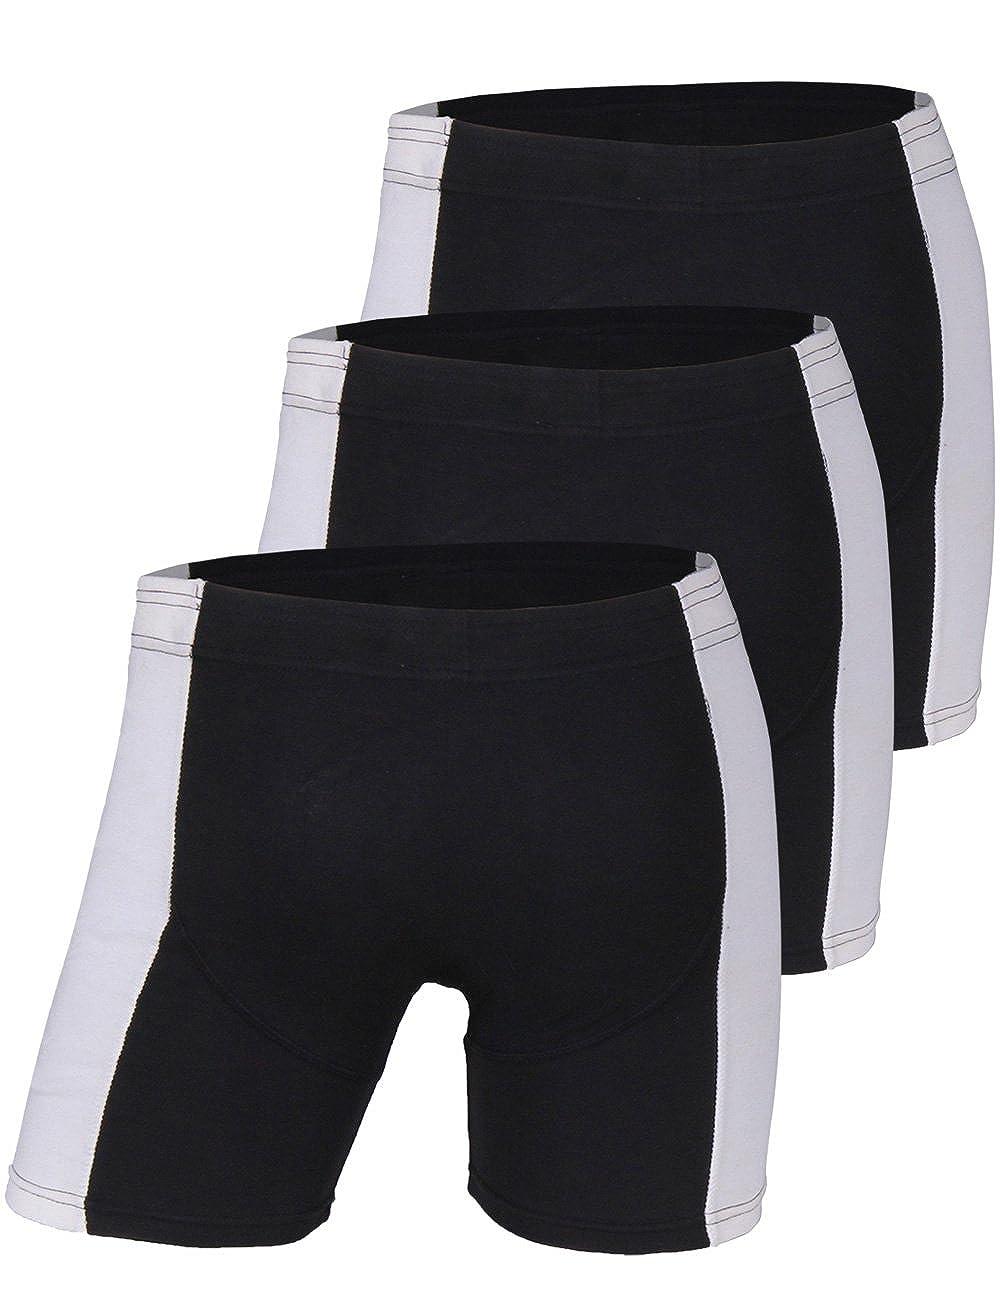 Godsen Mens 3 Pack Comfort Classic Sport Boxer Briefs